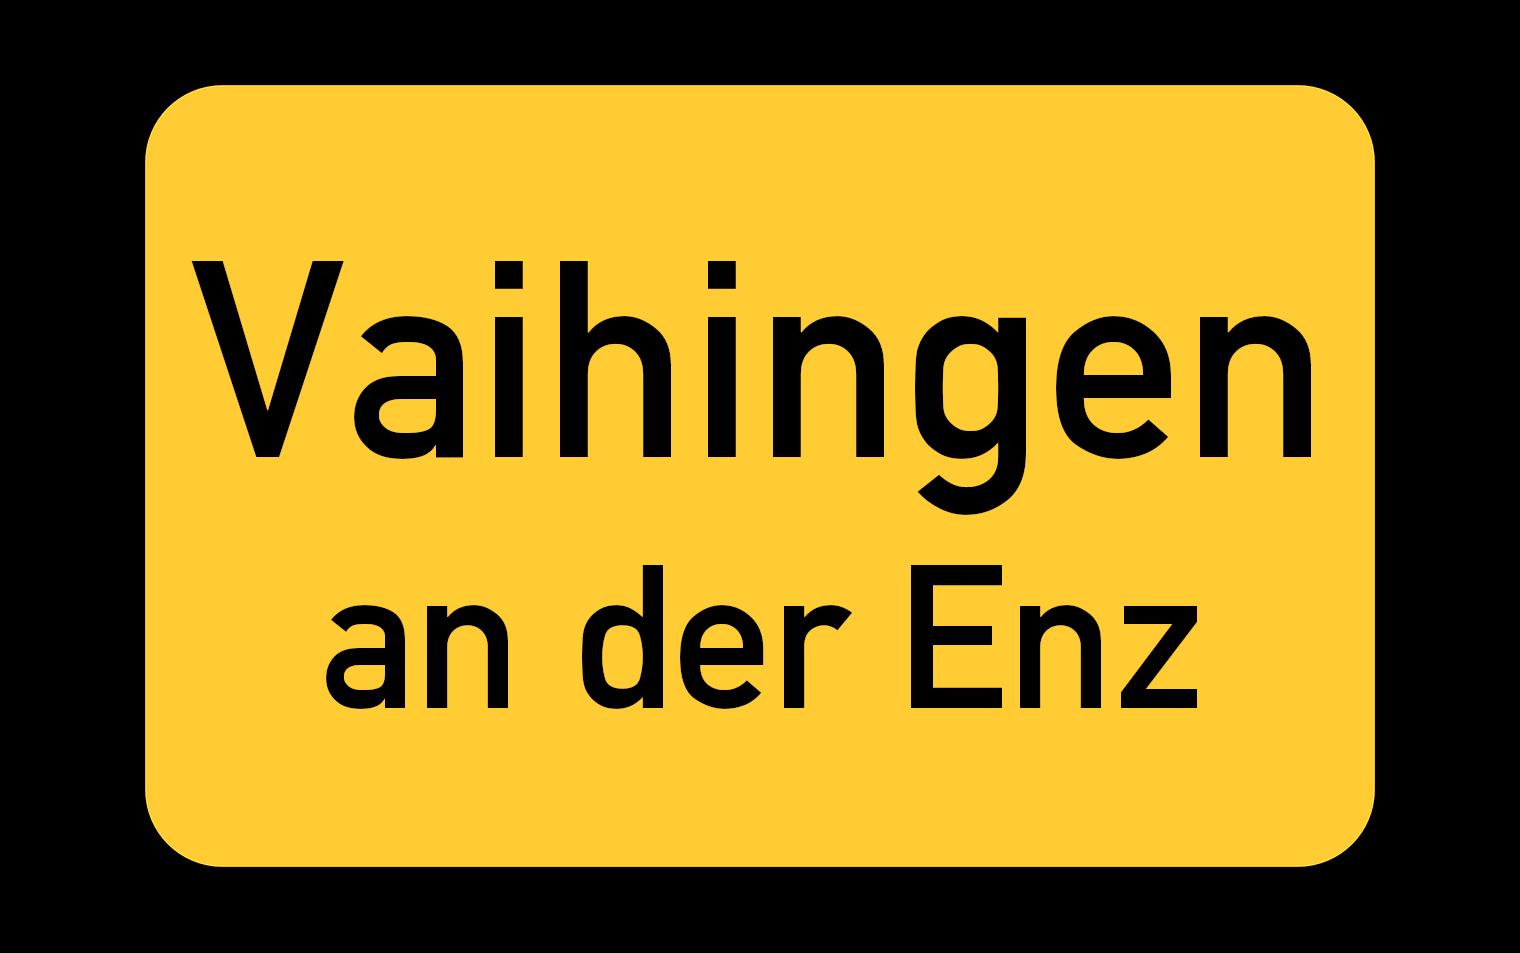 Isotox Schädlingsbekämpfung in Vaihingen an der Enz